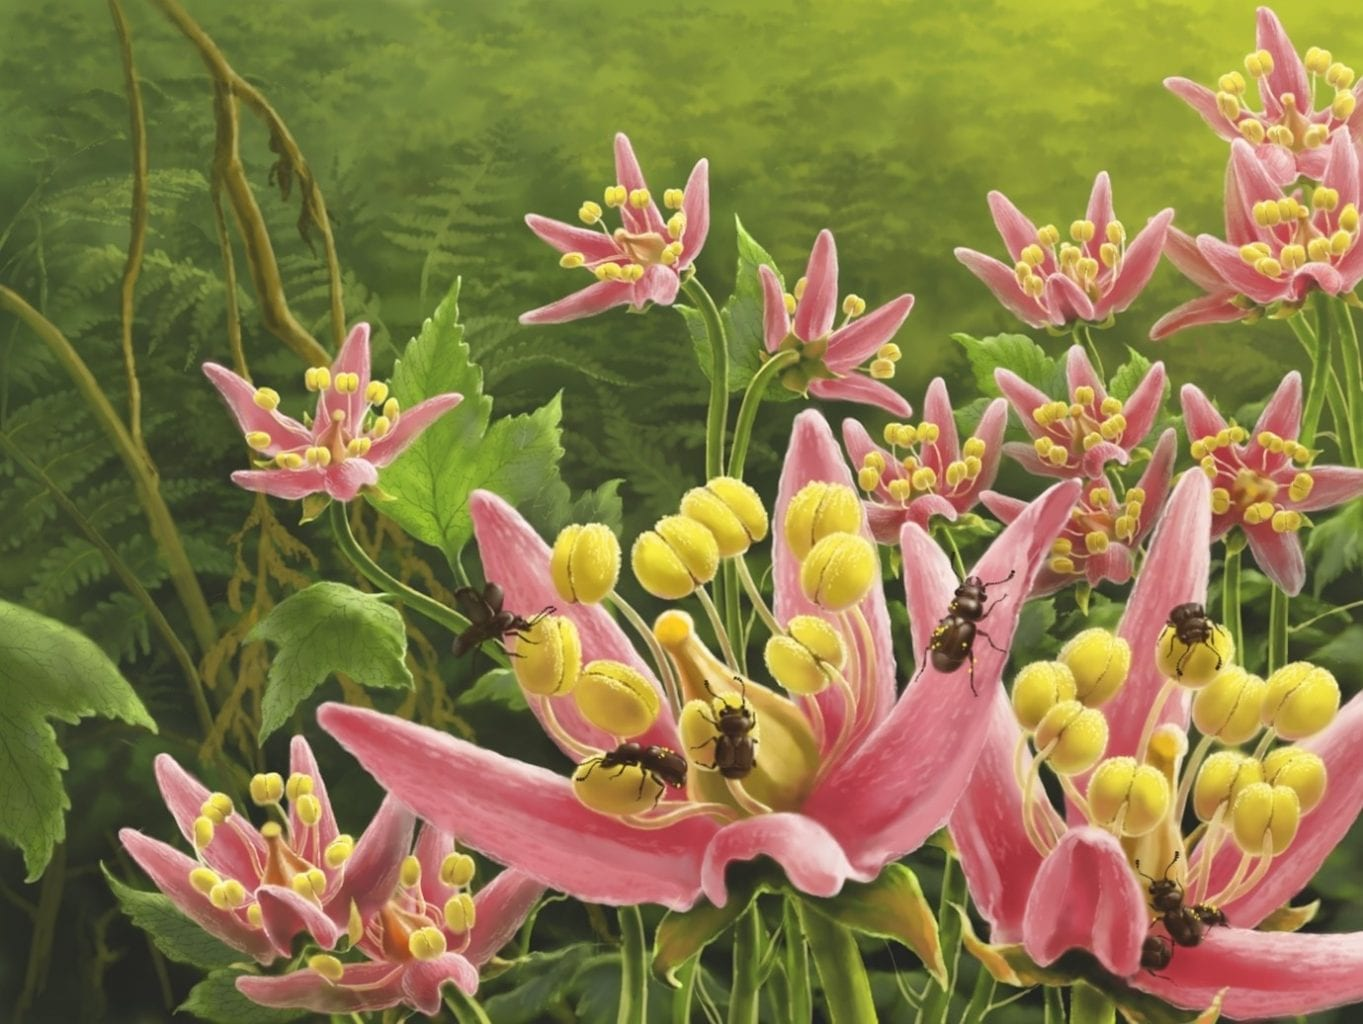 Ecological reconstruction presenting Pelretes vivificus on flowers. Credit: Jie Sun